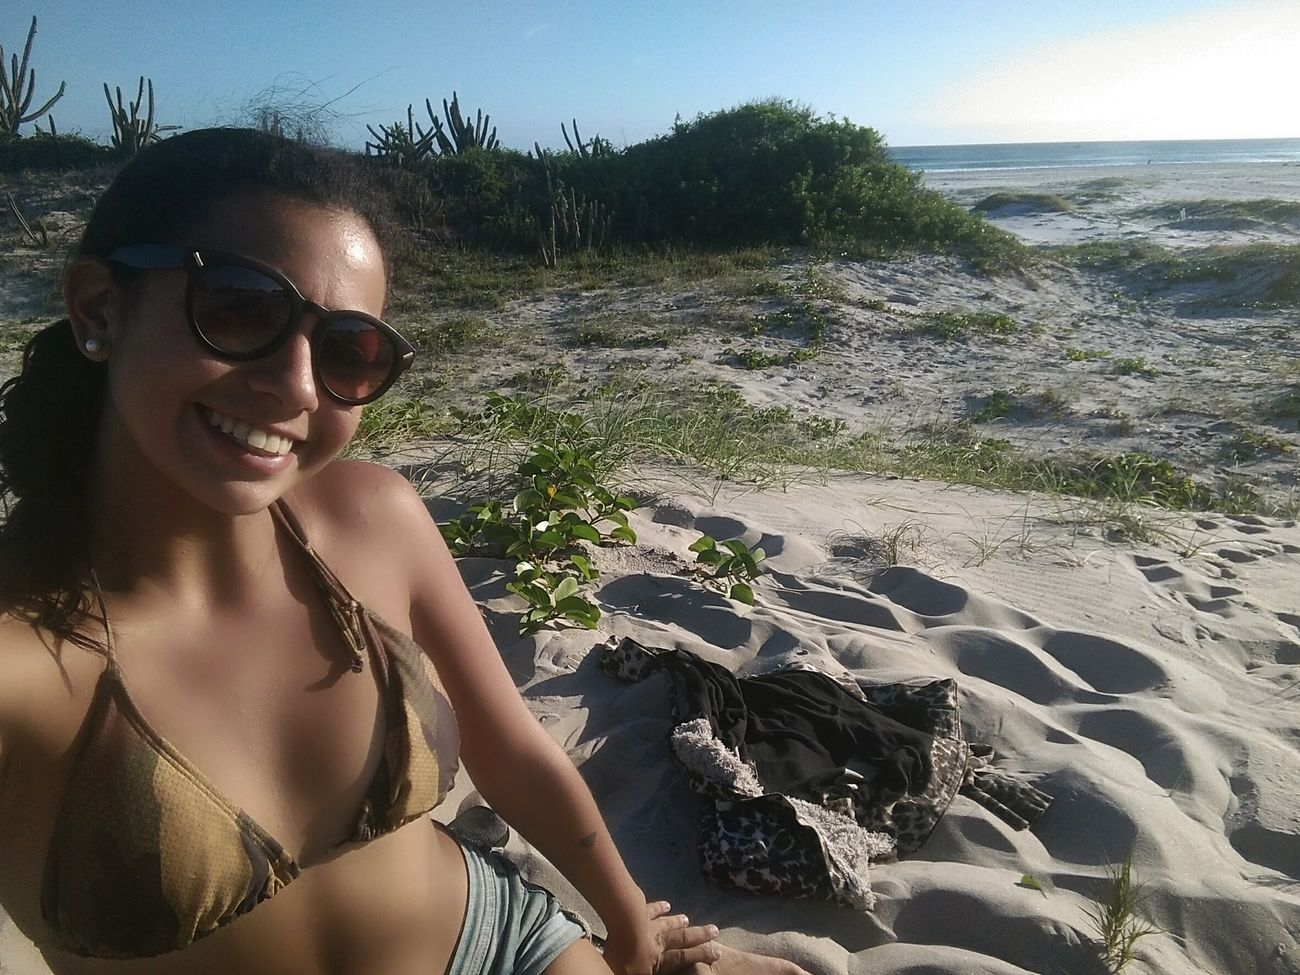 Beautiful Girl Happiness Portrait Traveller Travel Destinations Universe Paisajes Naturales Natureza Blue Sand Sea Beach Playa Arraial Do Cabo